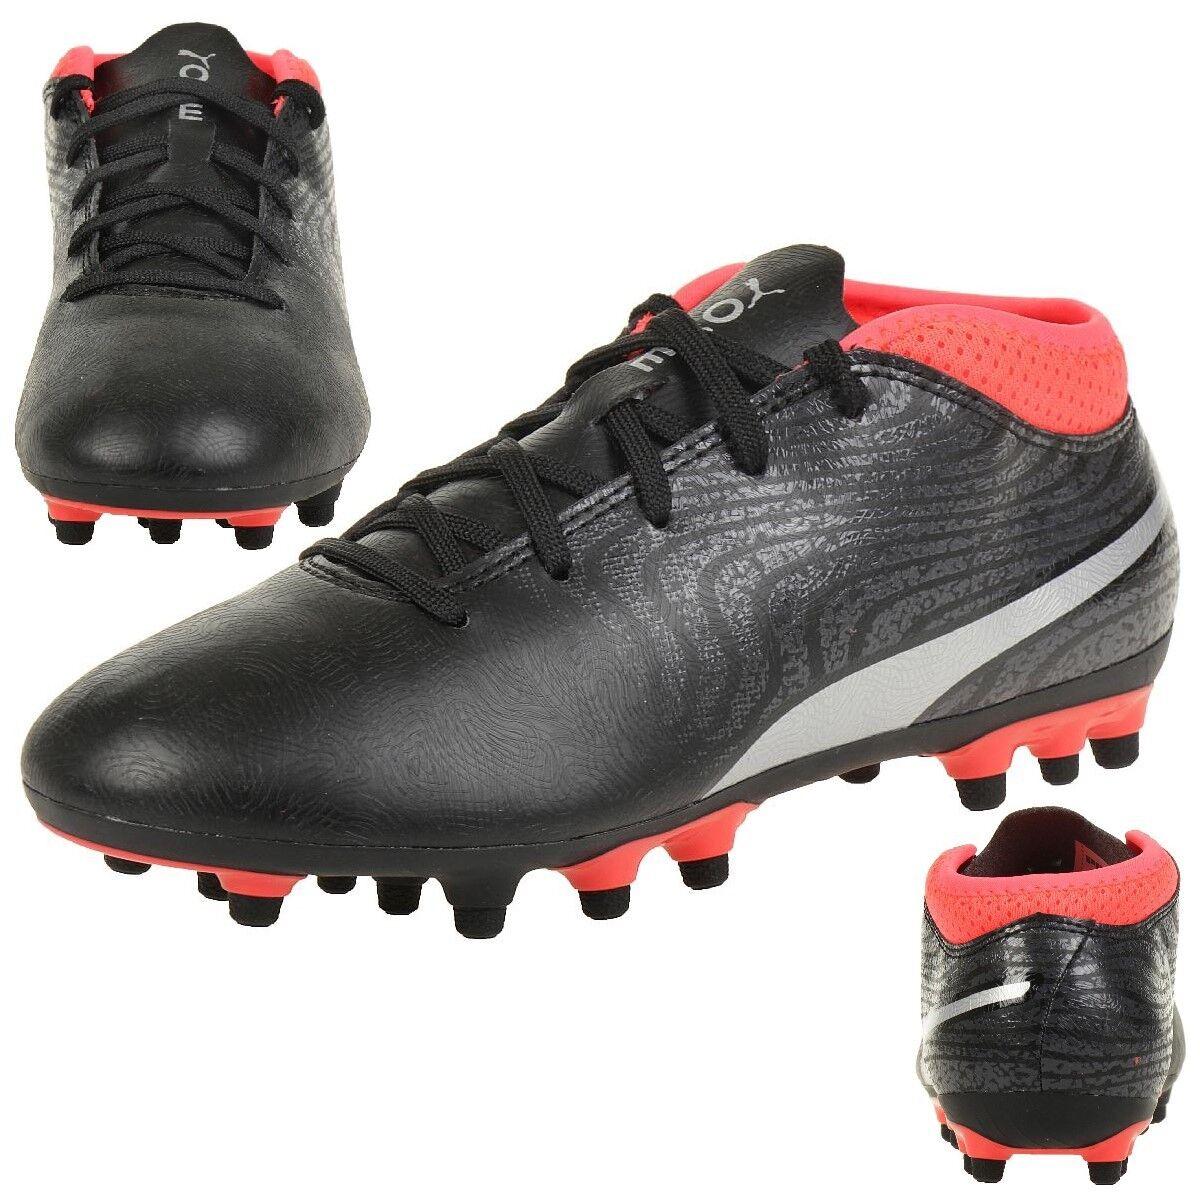 Puma Niños Zapatos de Fútbol One 18.4 Ag Jr Fútbol 104554 01